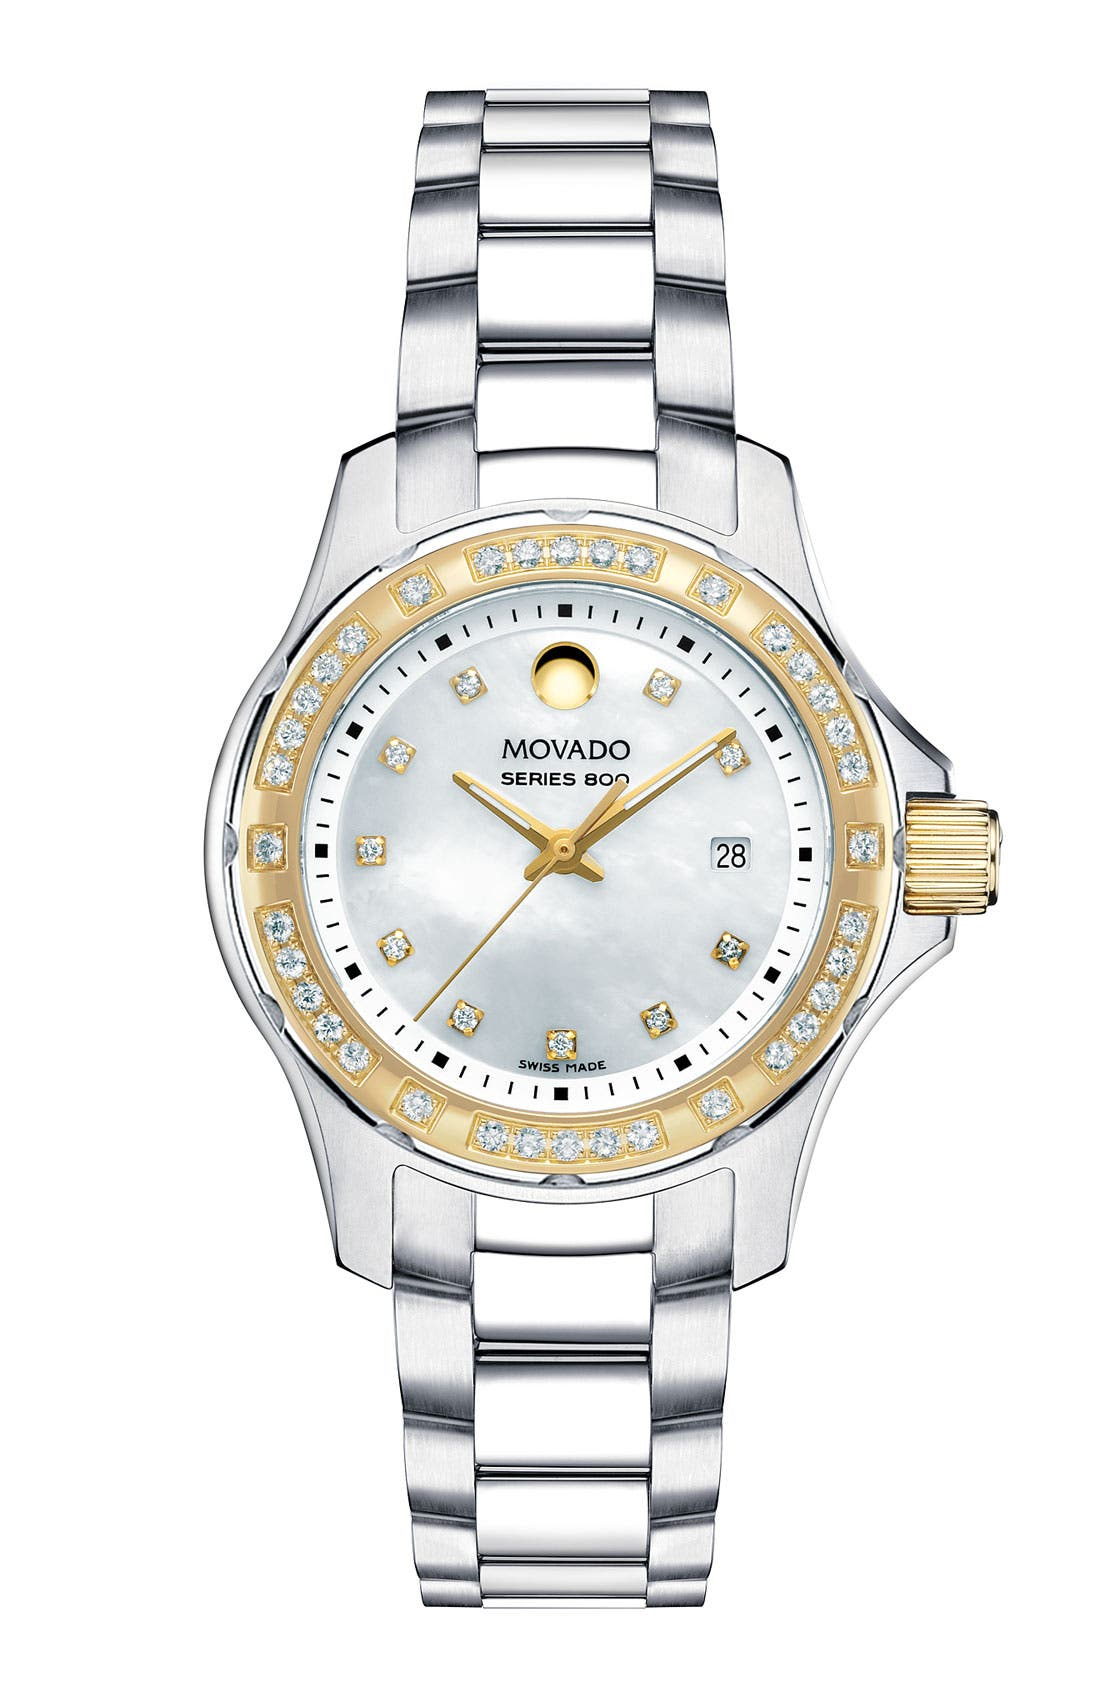 Main Image - Movado 'Series 800' Two Tone Diamond Bracelet Watch, 29mm